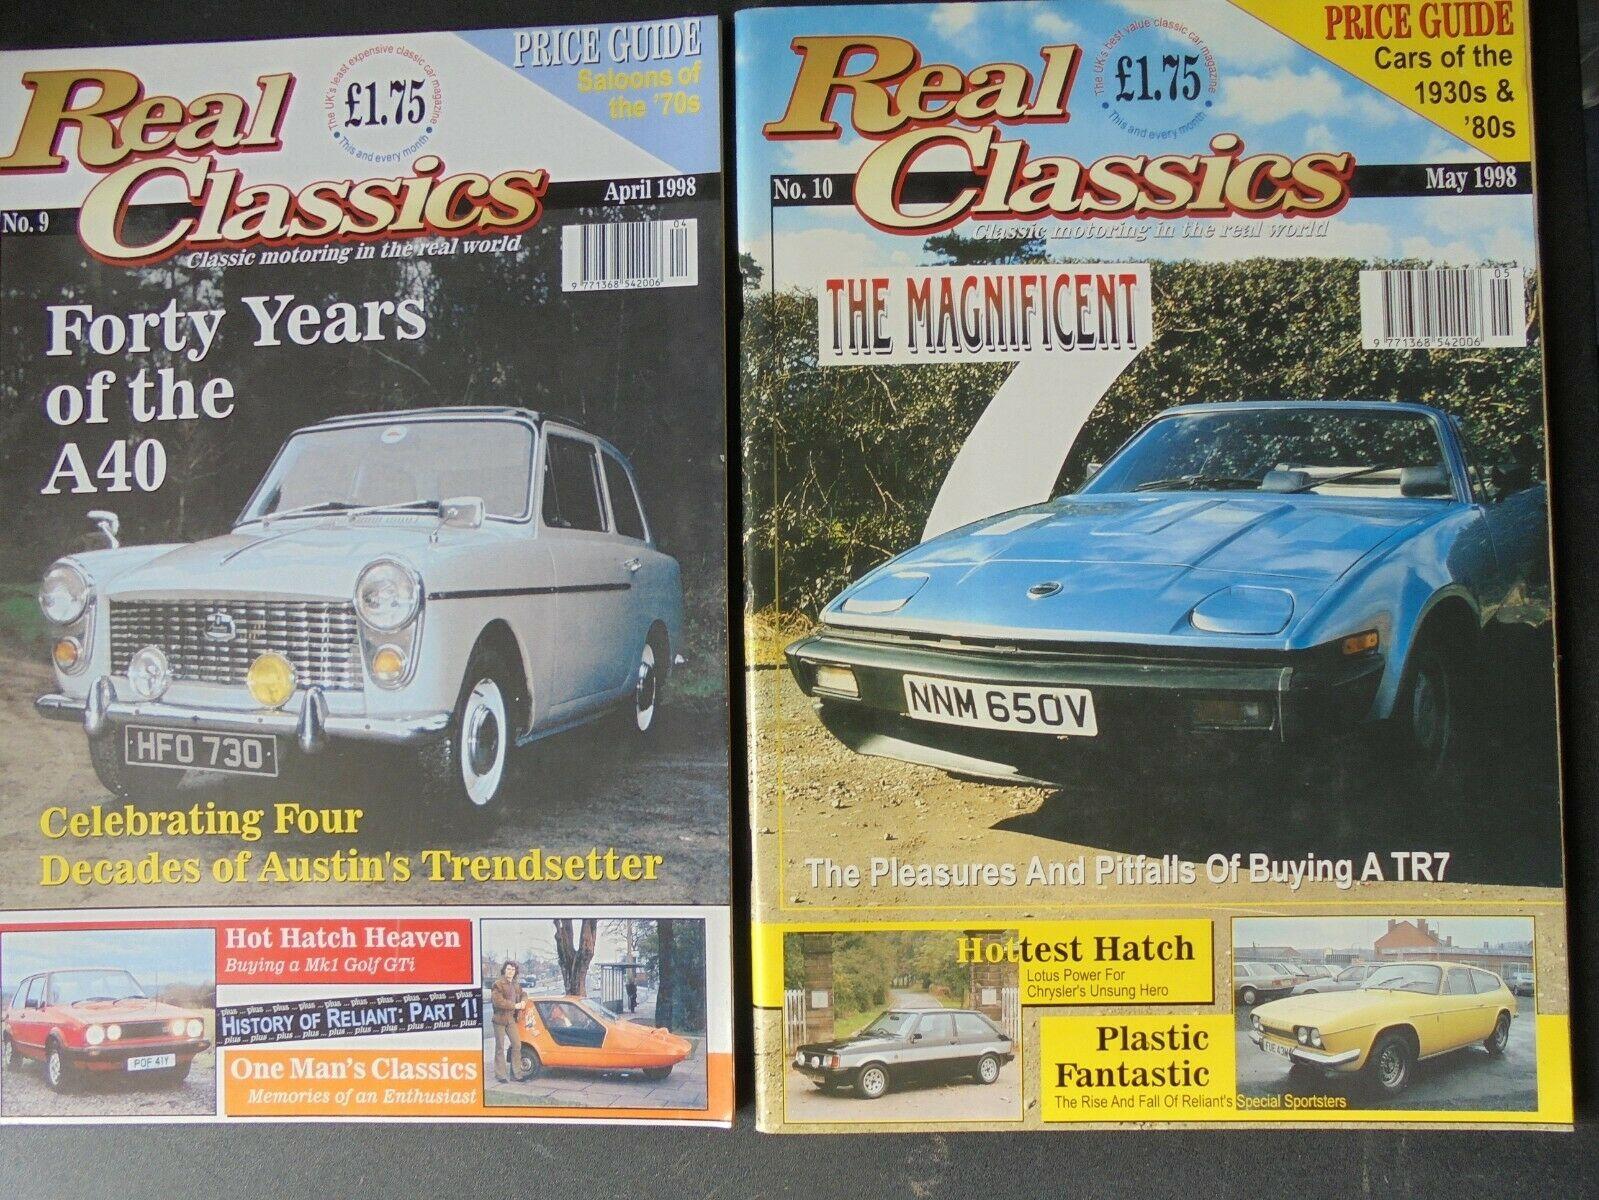 Real Classics 9 & 10.jpg